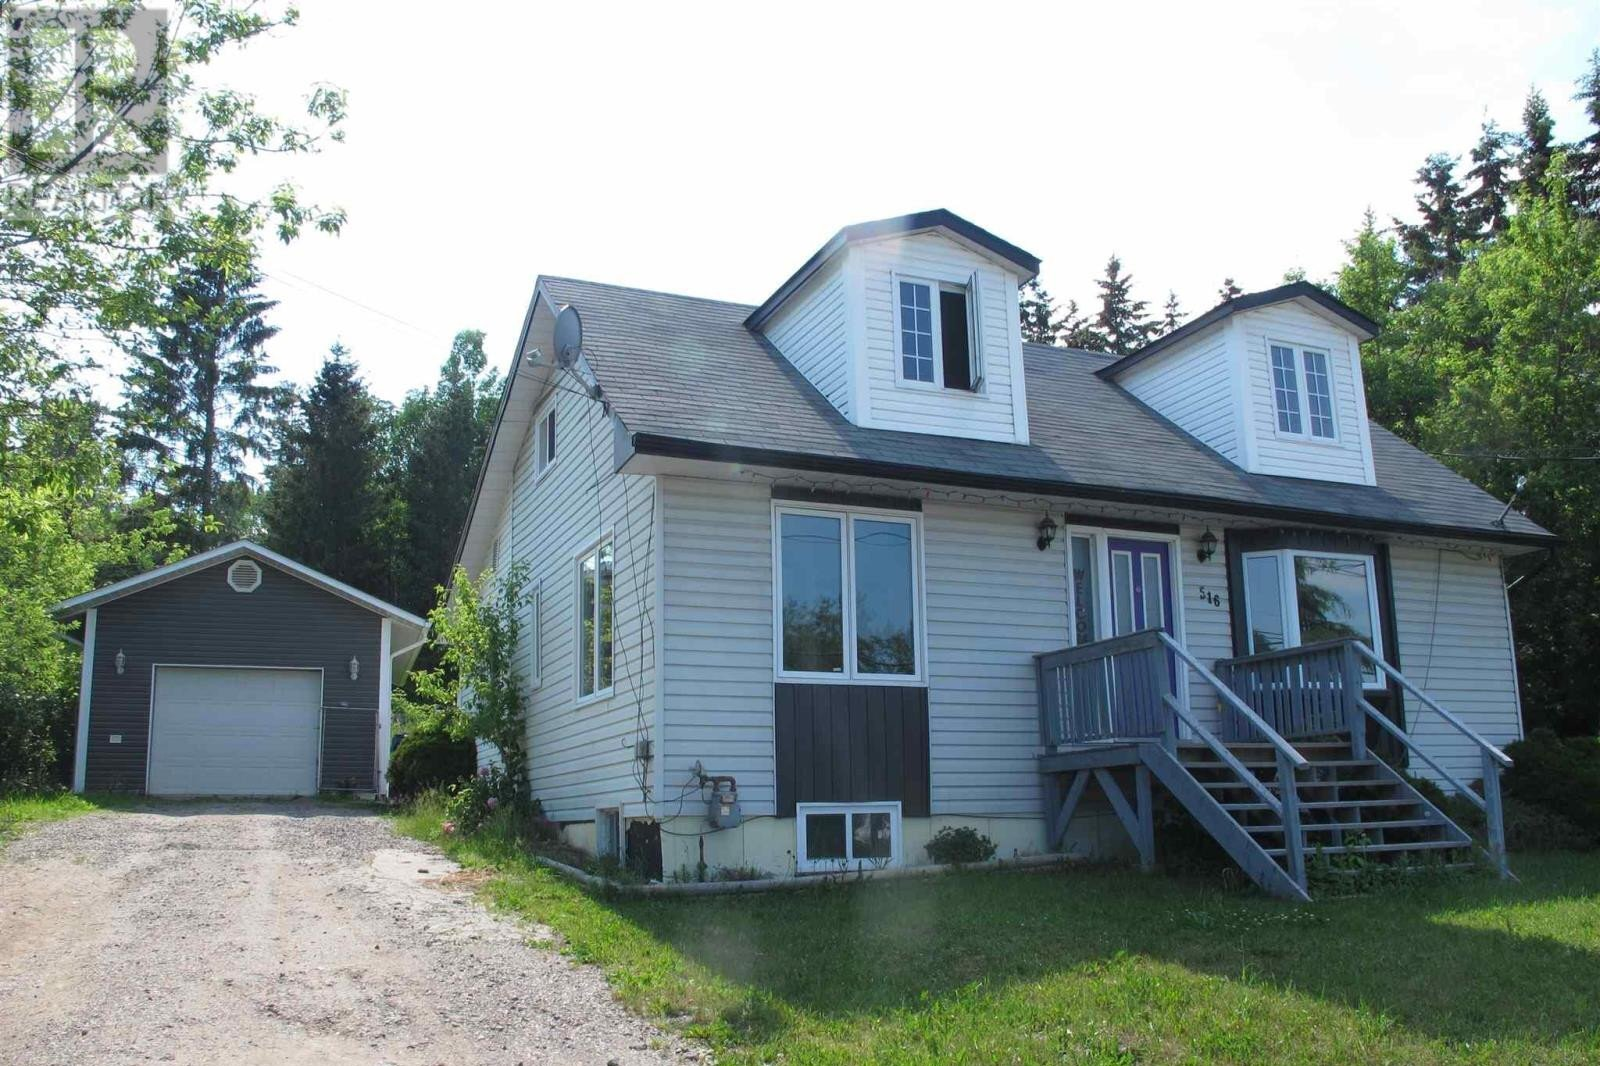 House for sale at 516 Lakeshore Rd Temiskaming Shores Ontario - MLS: TM202114